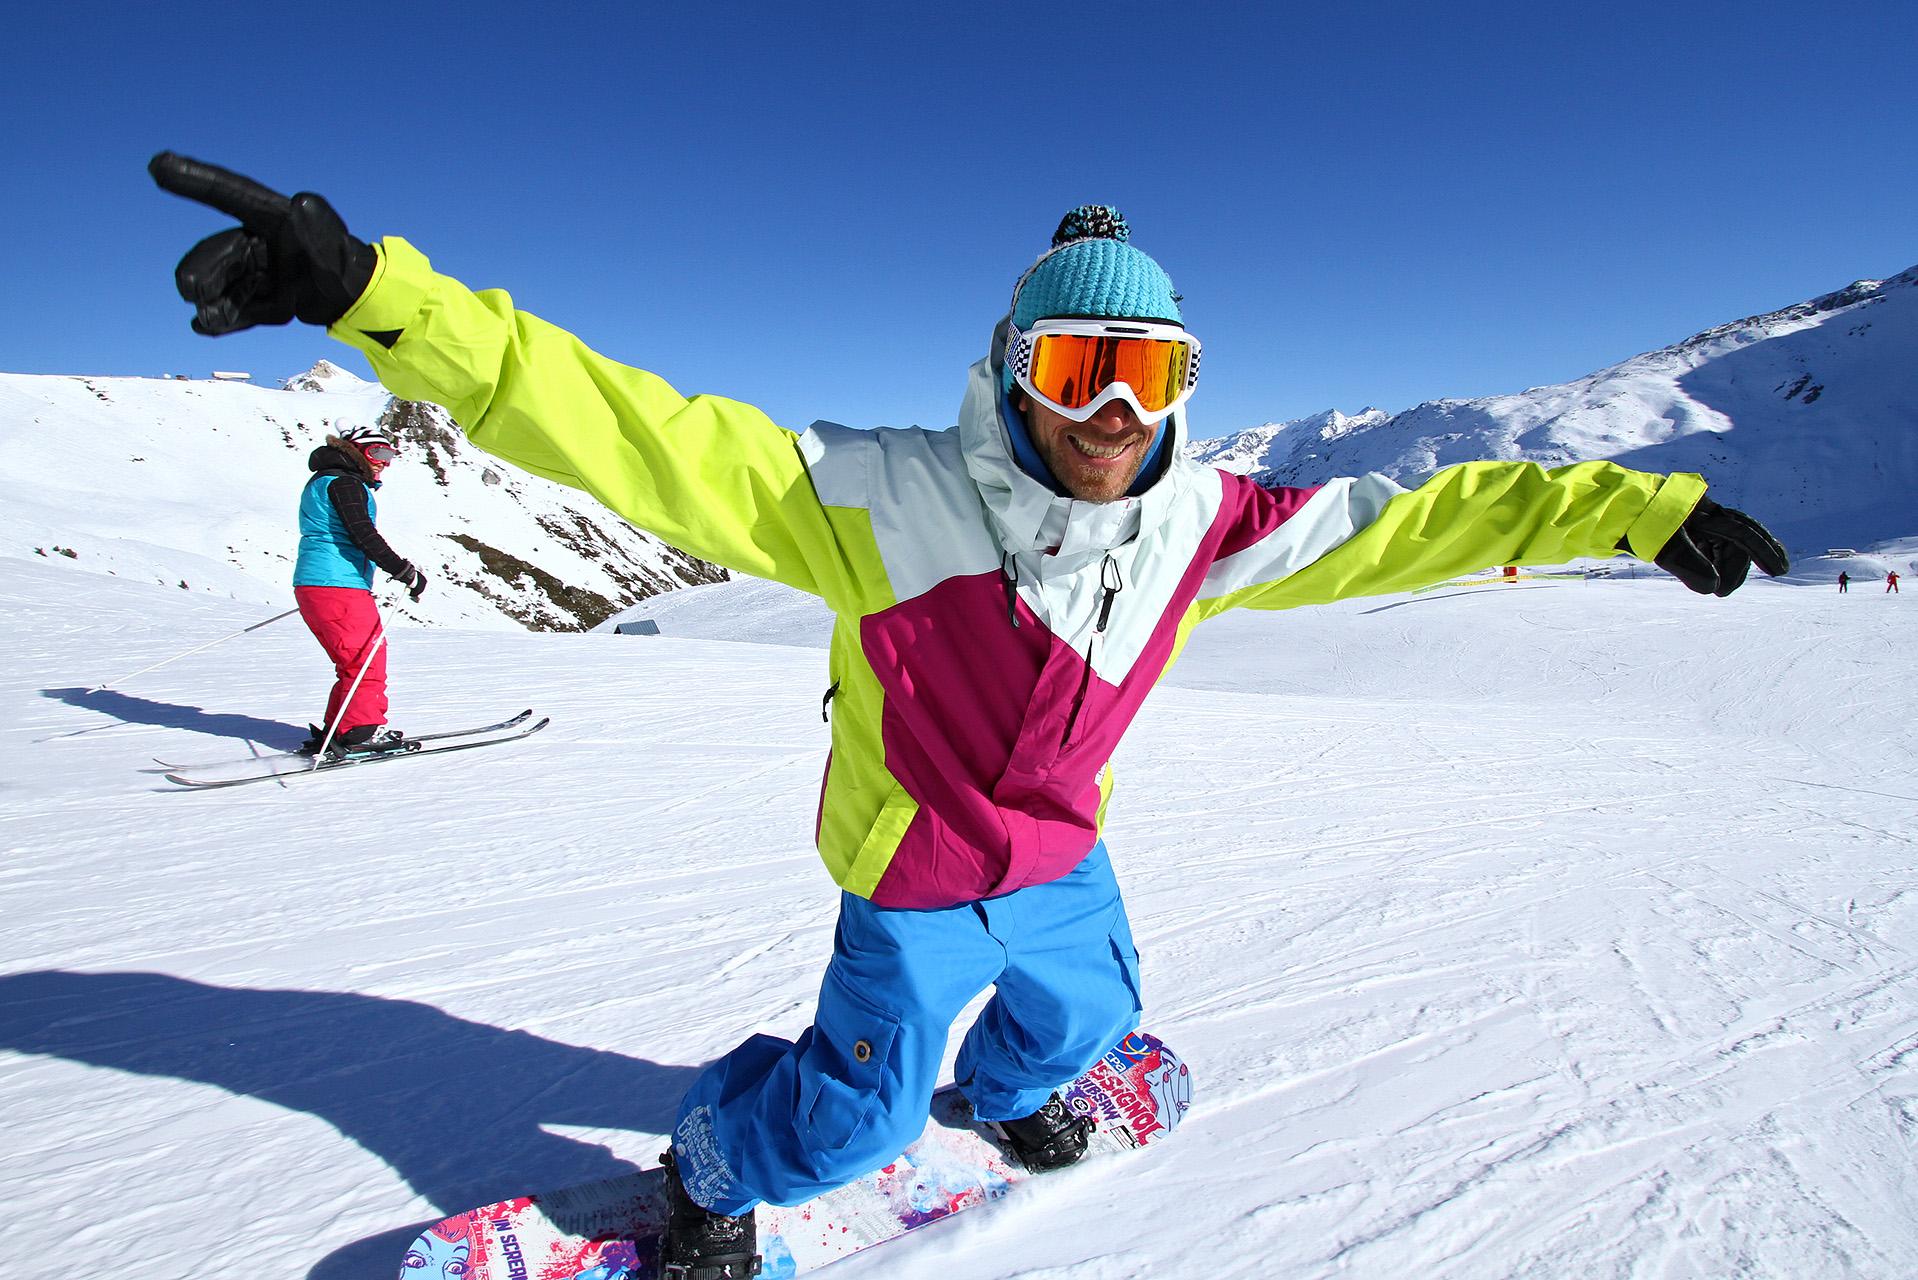 Snowboard à la cool